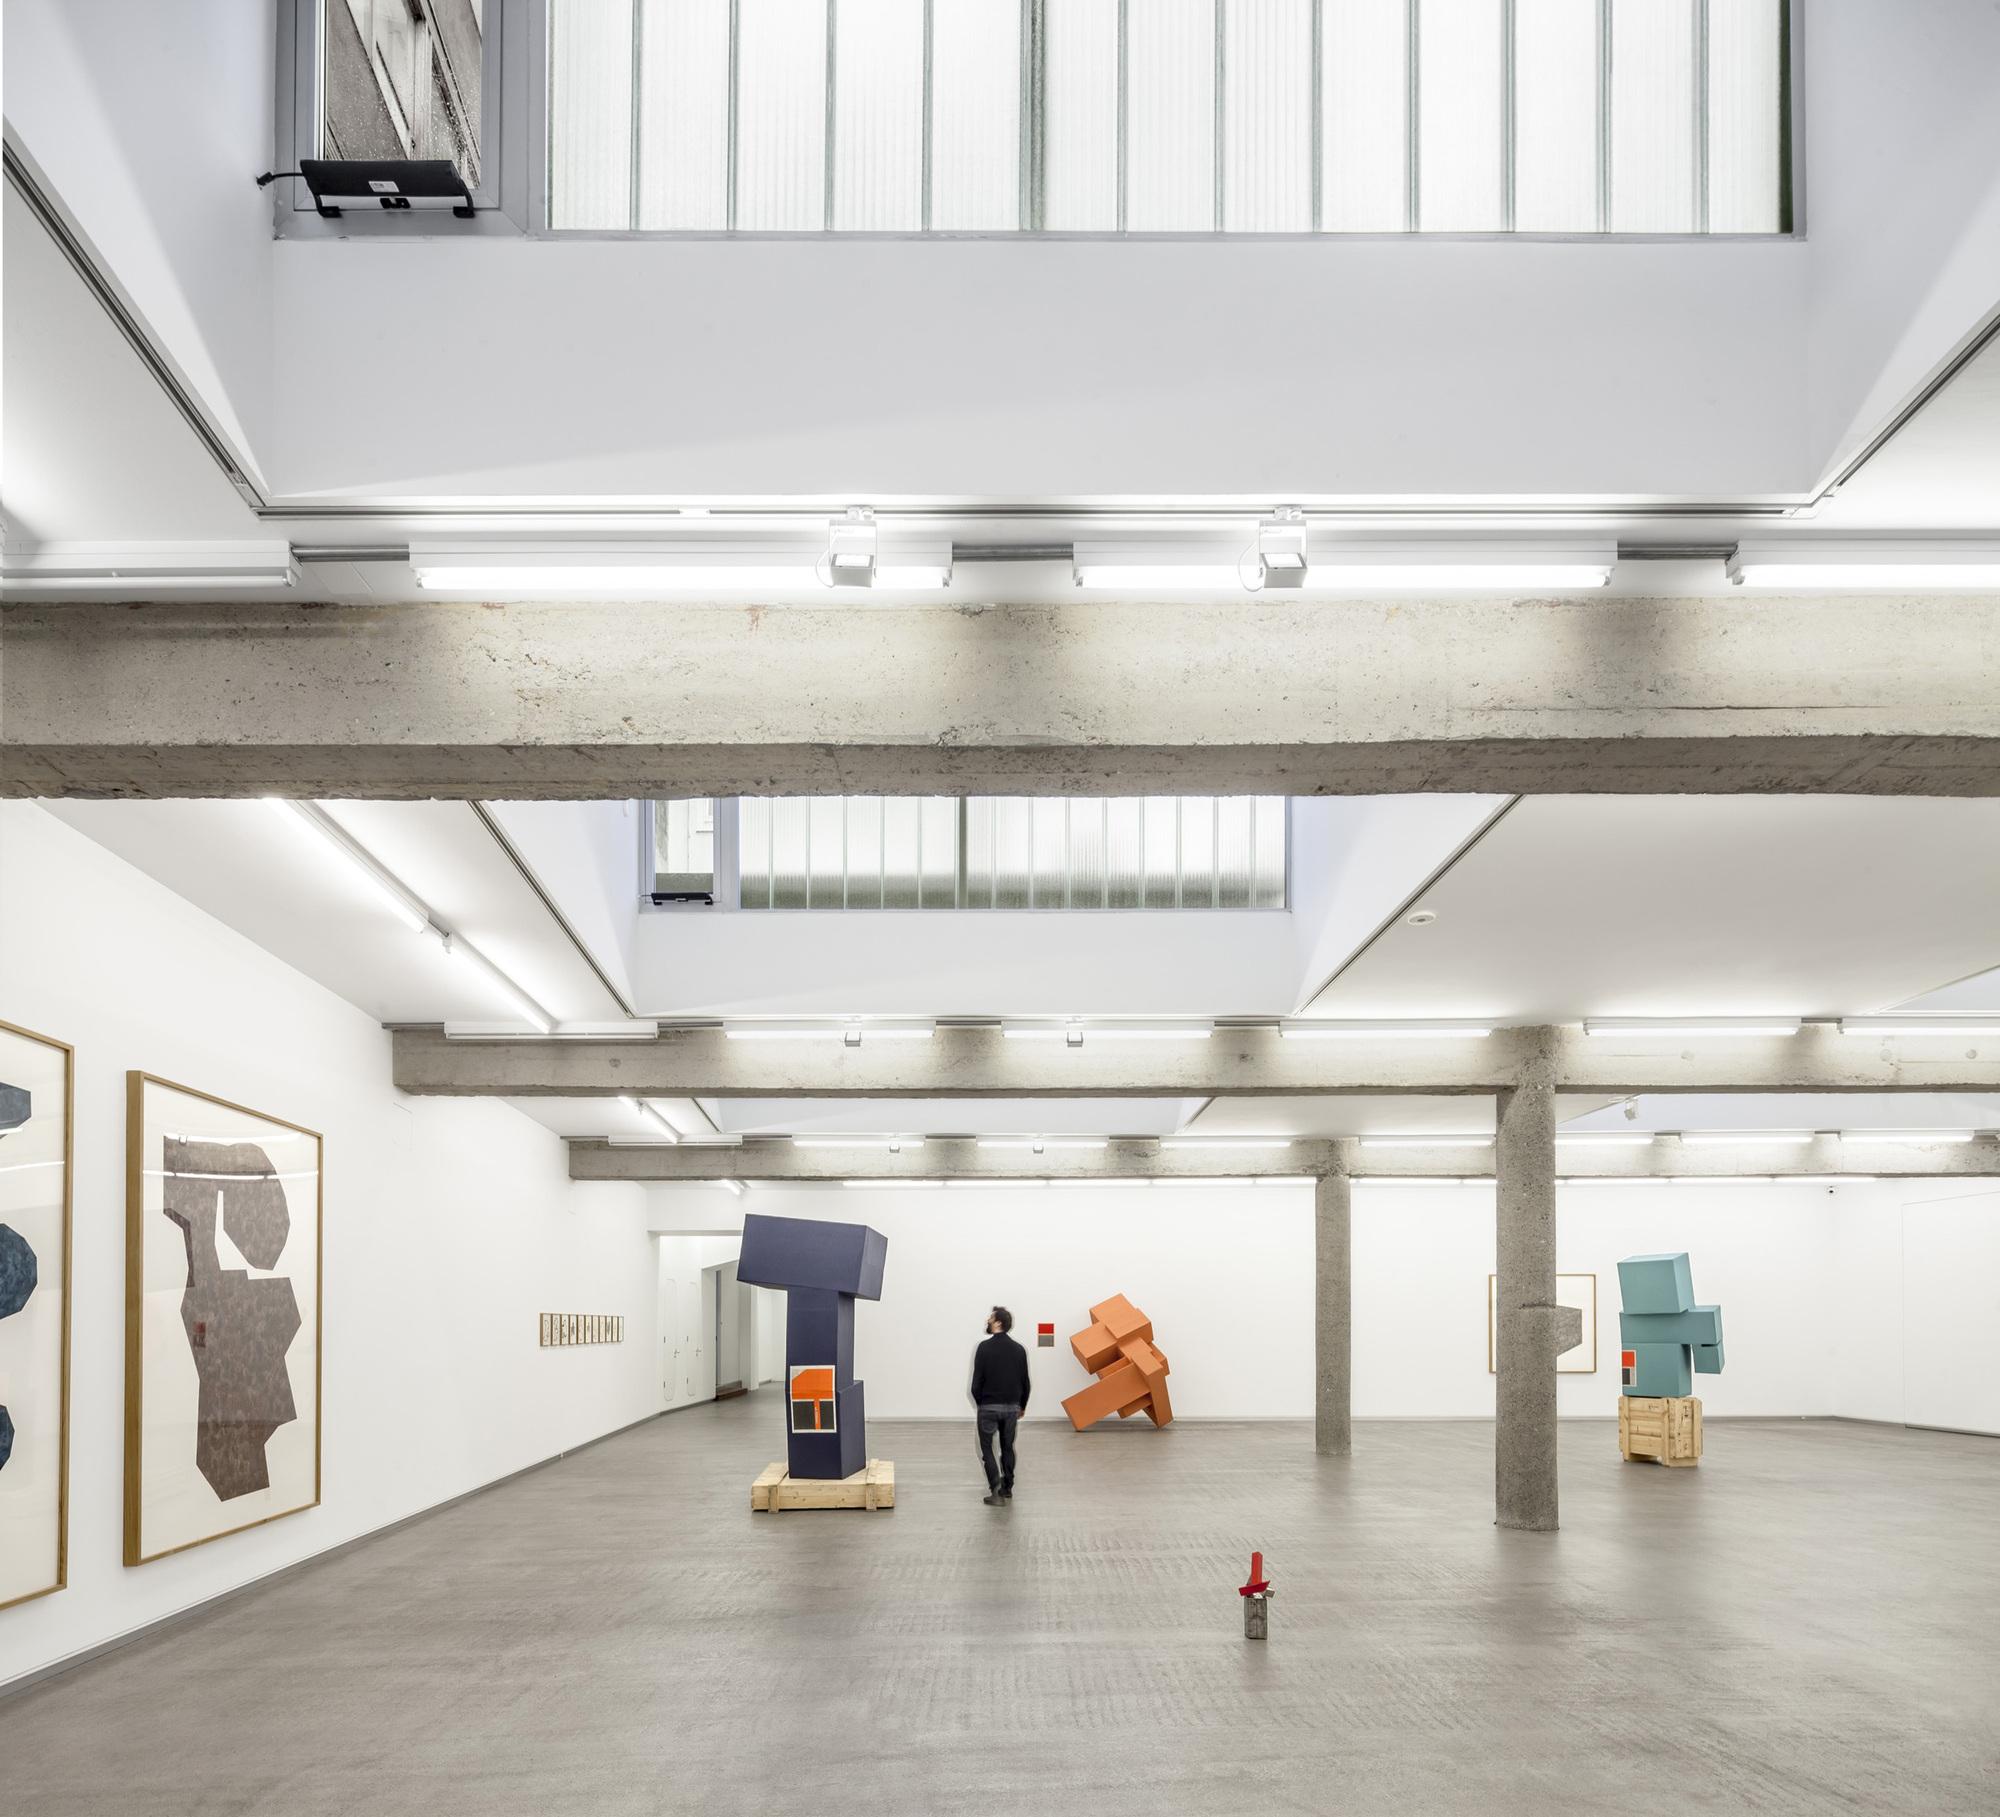 Carreras m gica contemporary art gallery estudio - Estudios arquitectura bilbao ...